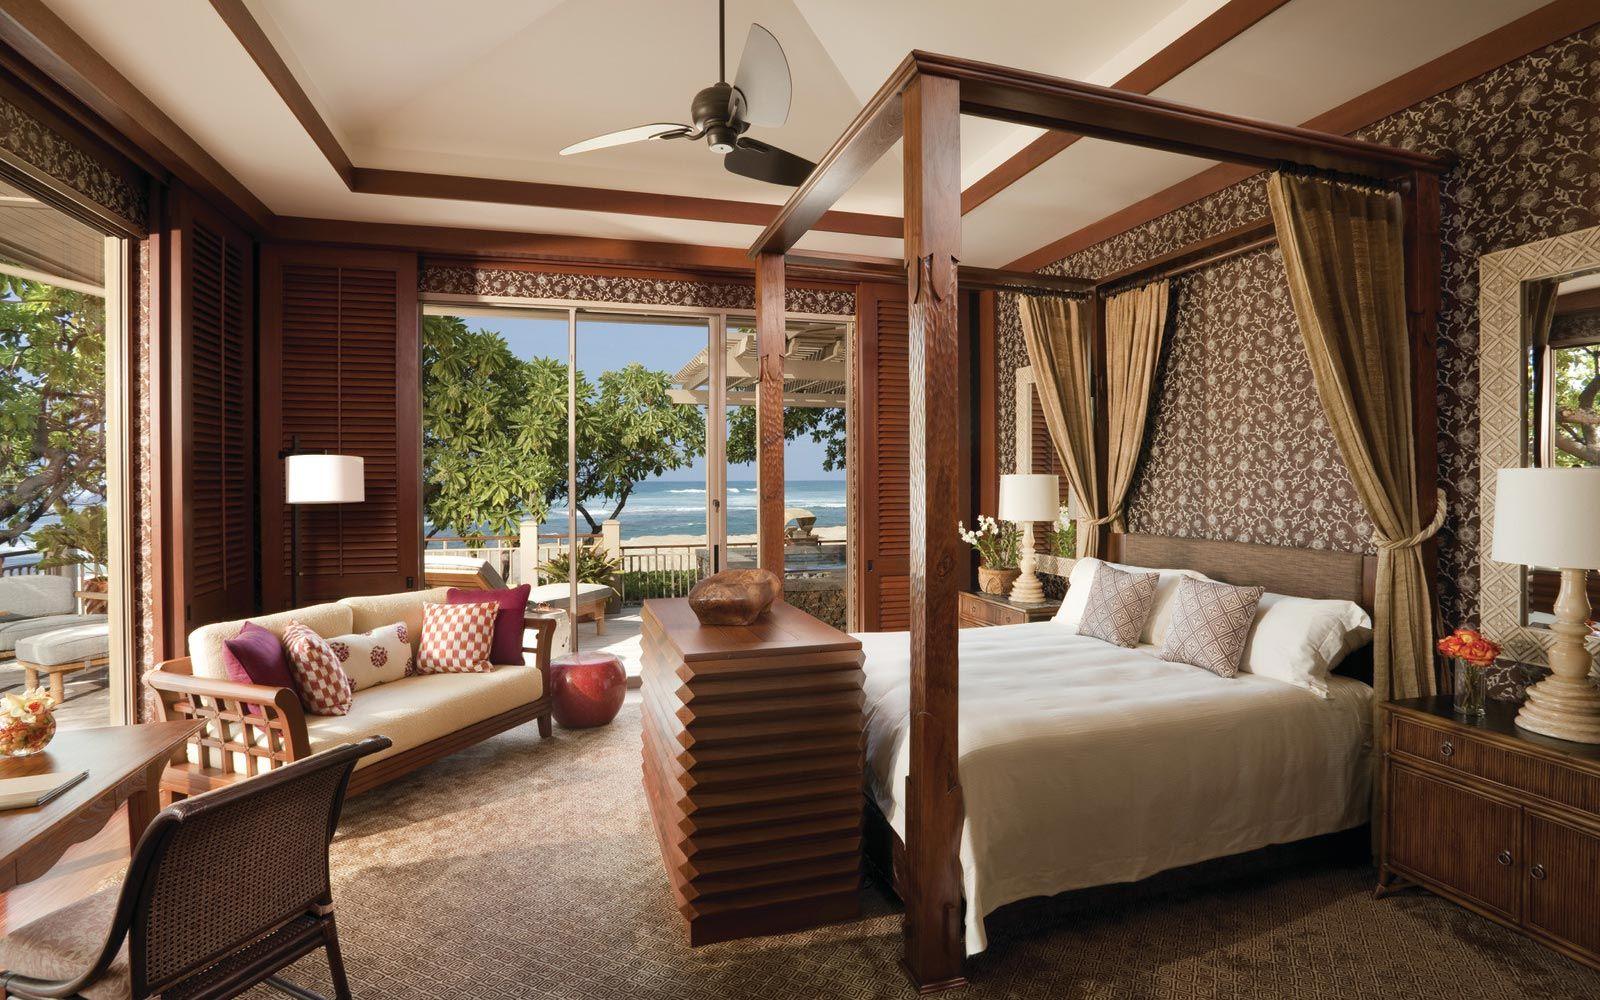 The Top 20 Resort Hotels In Hawaii In 2020 Hawaii Hotels Hotel Suite Luxury Dream Hotels